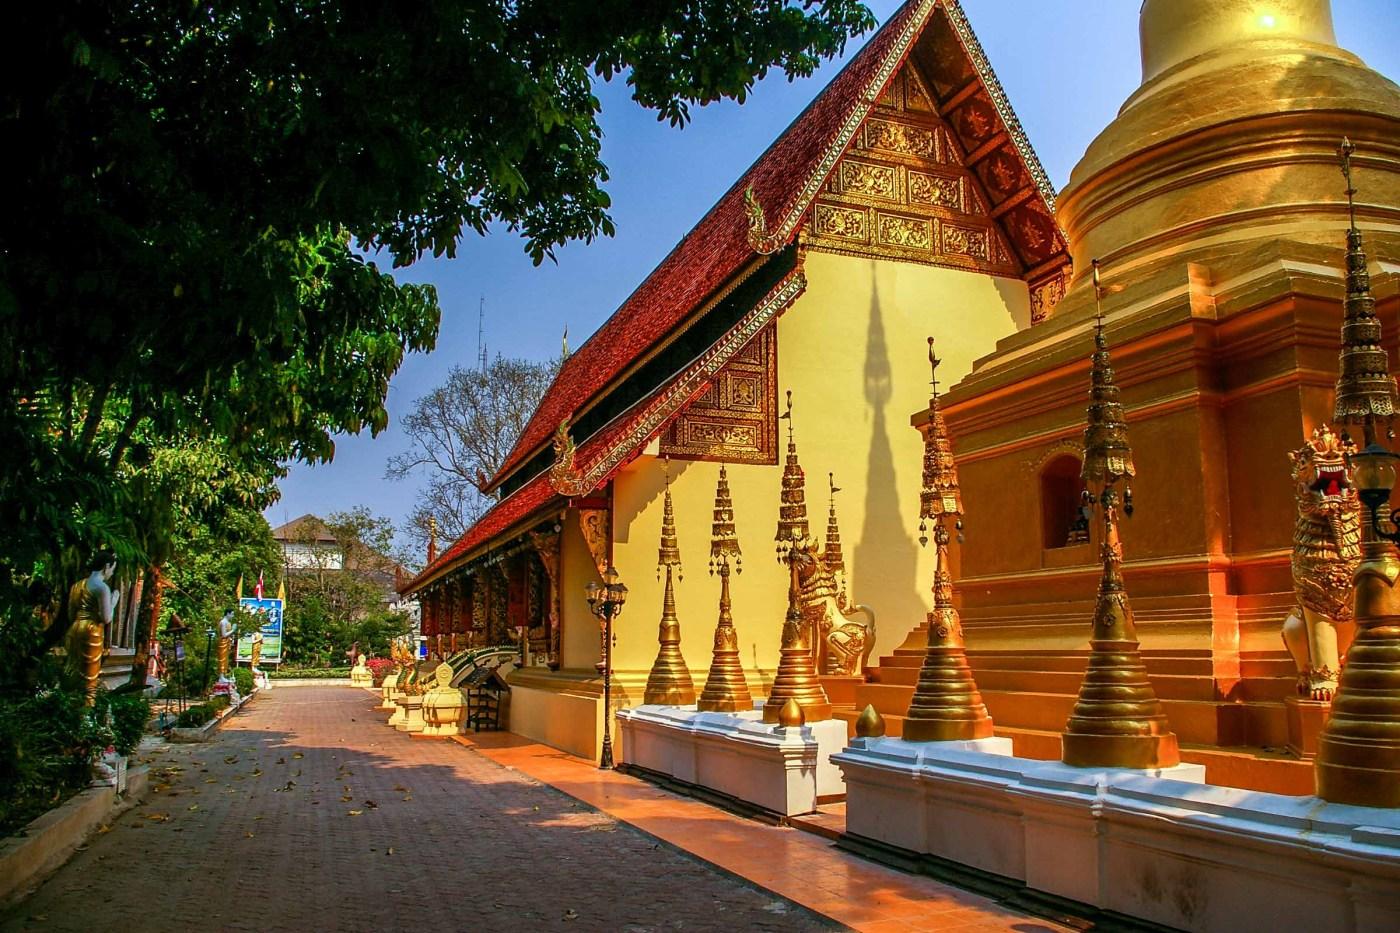 Temple voyage blog Thaïlande blog voyage trois semaines en thaïlande